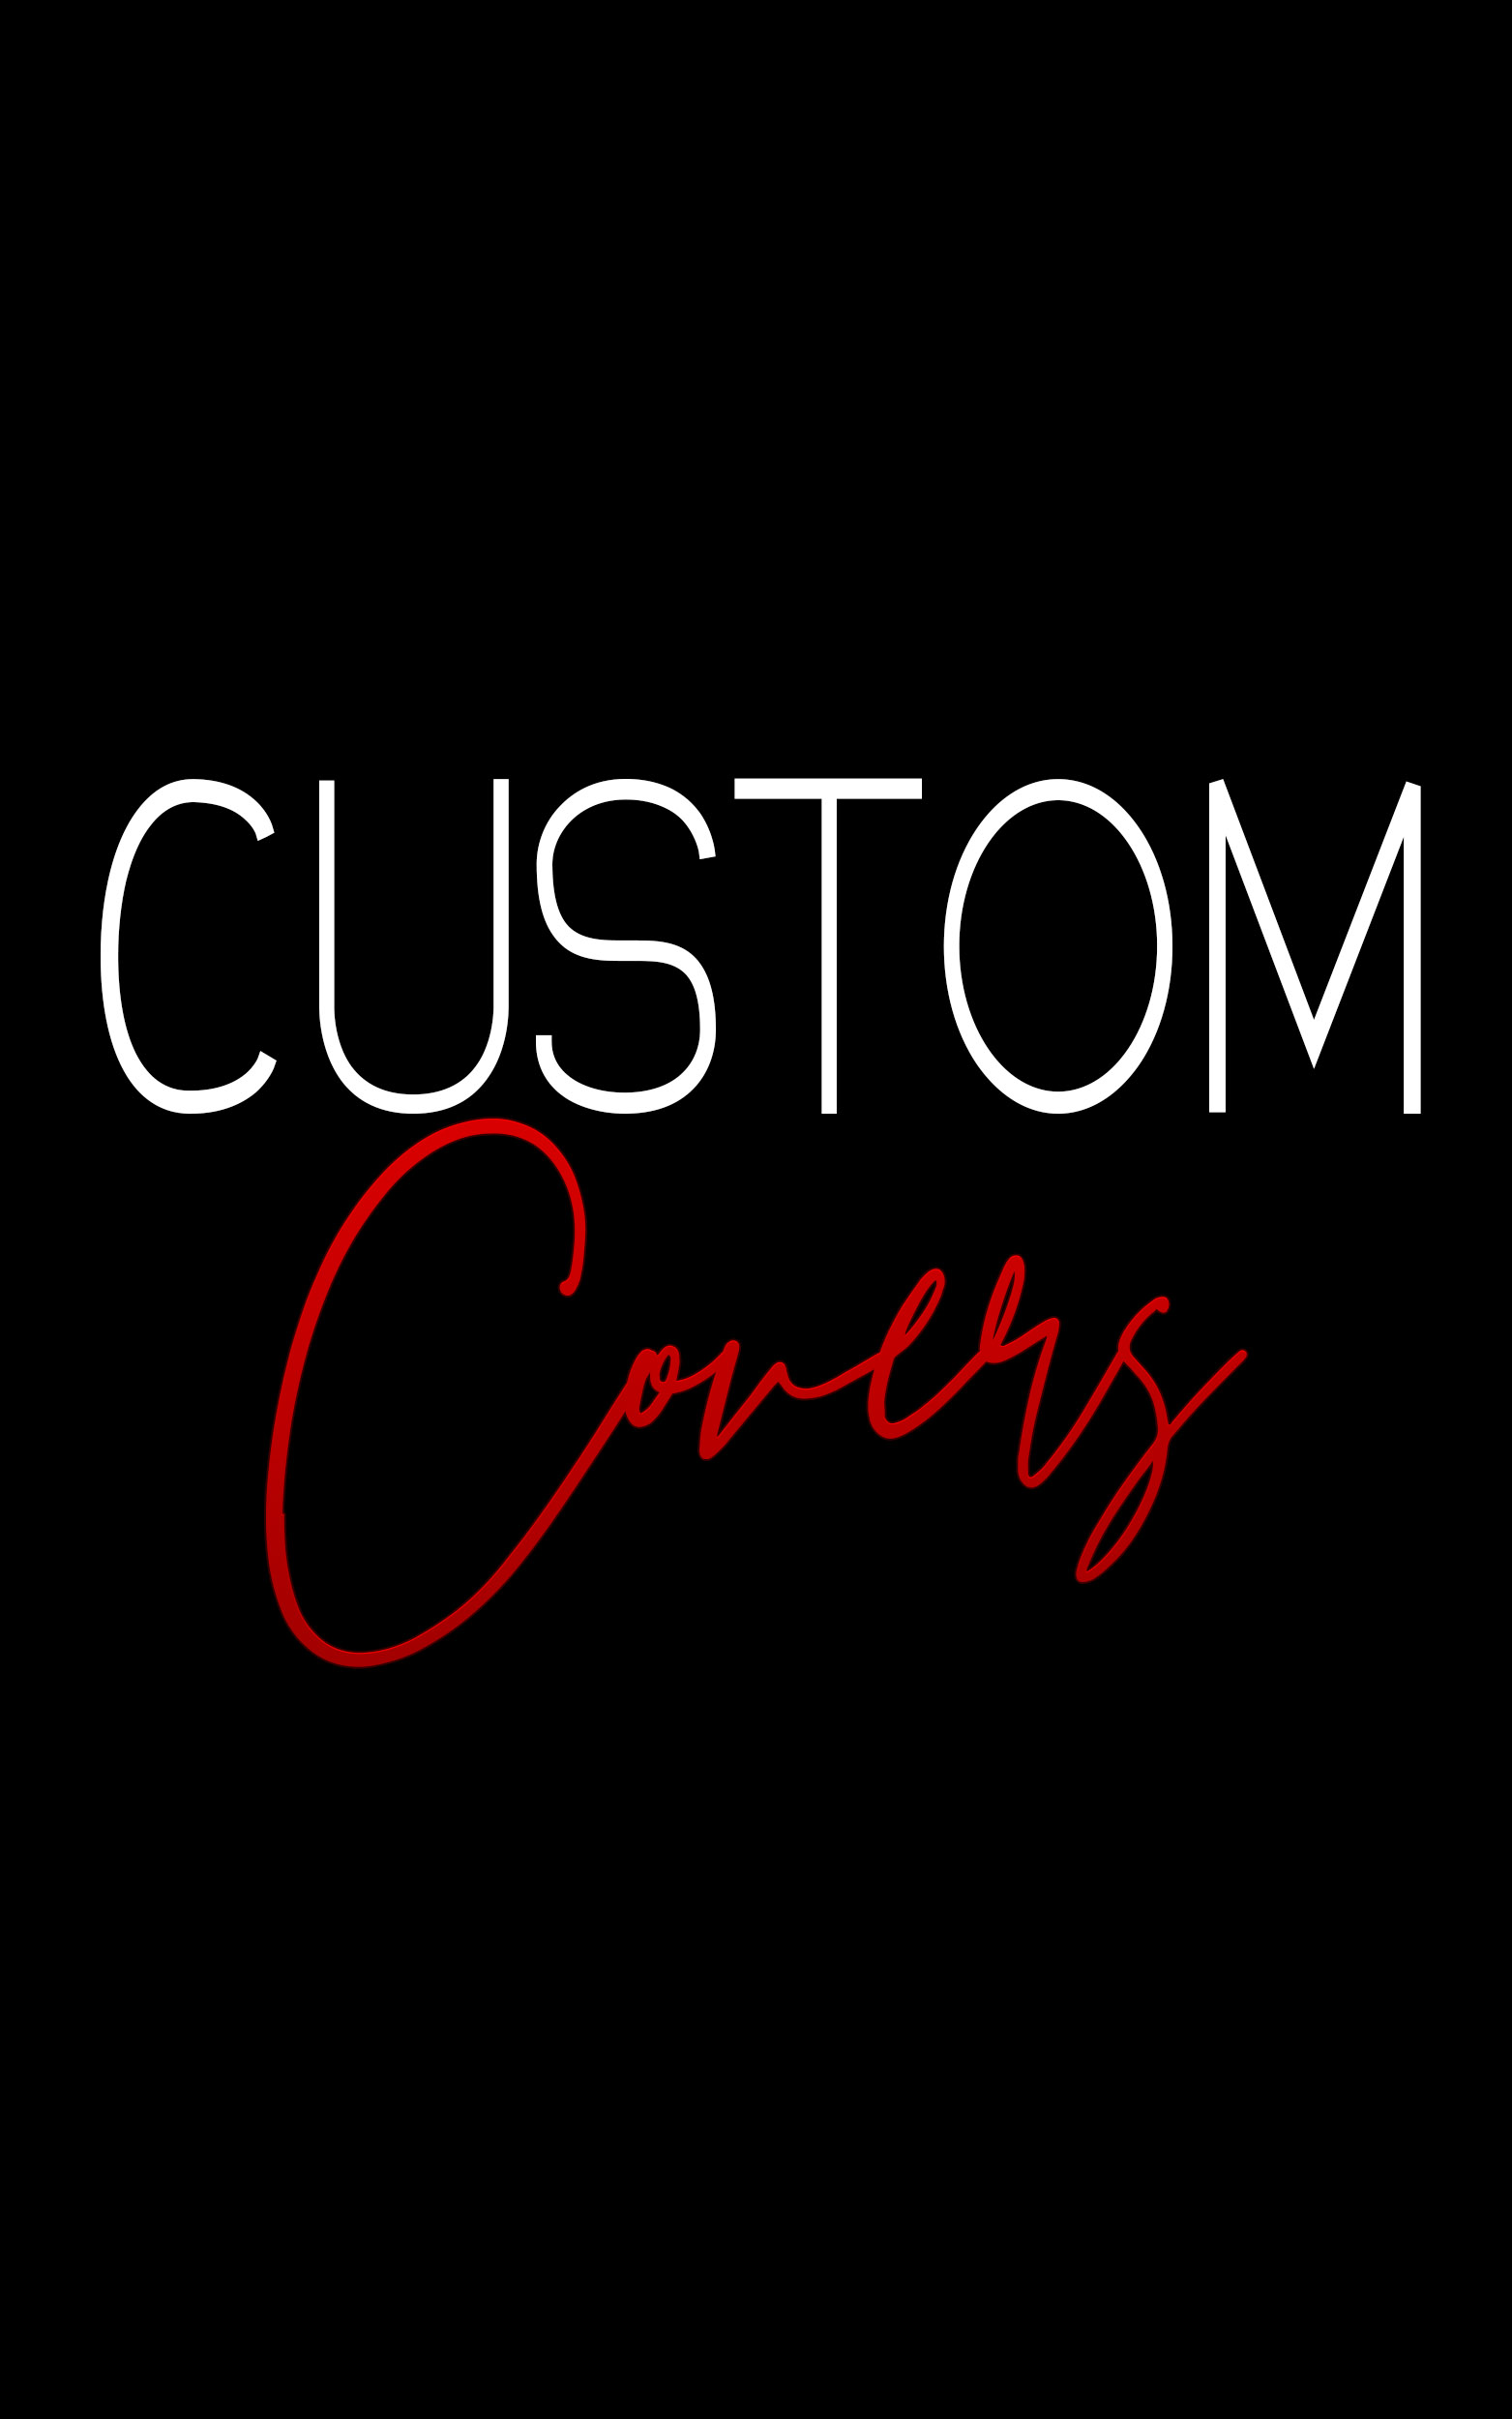 Custom Covers Poster